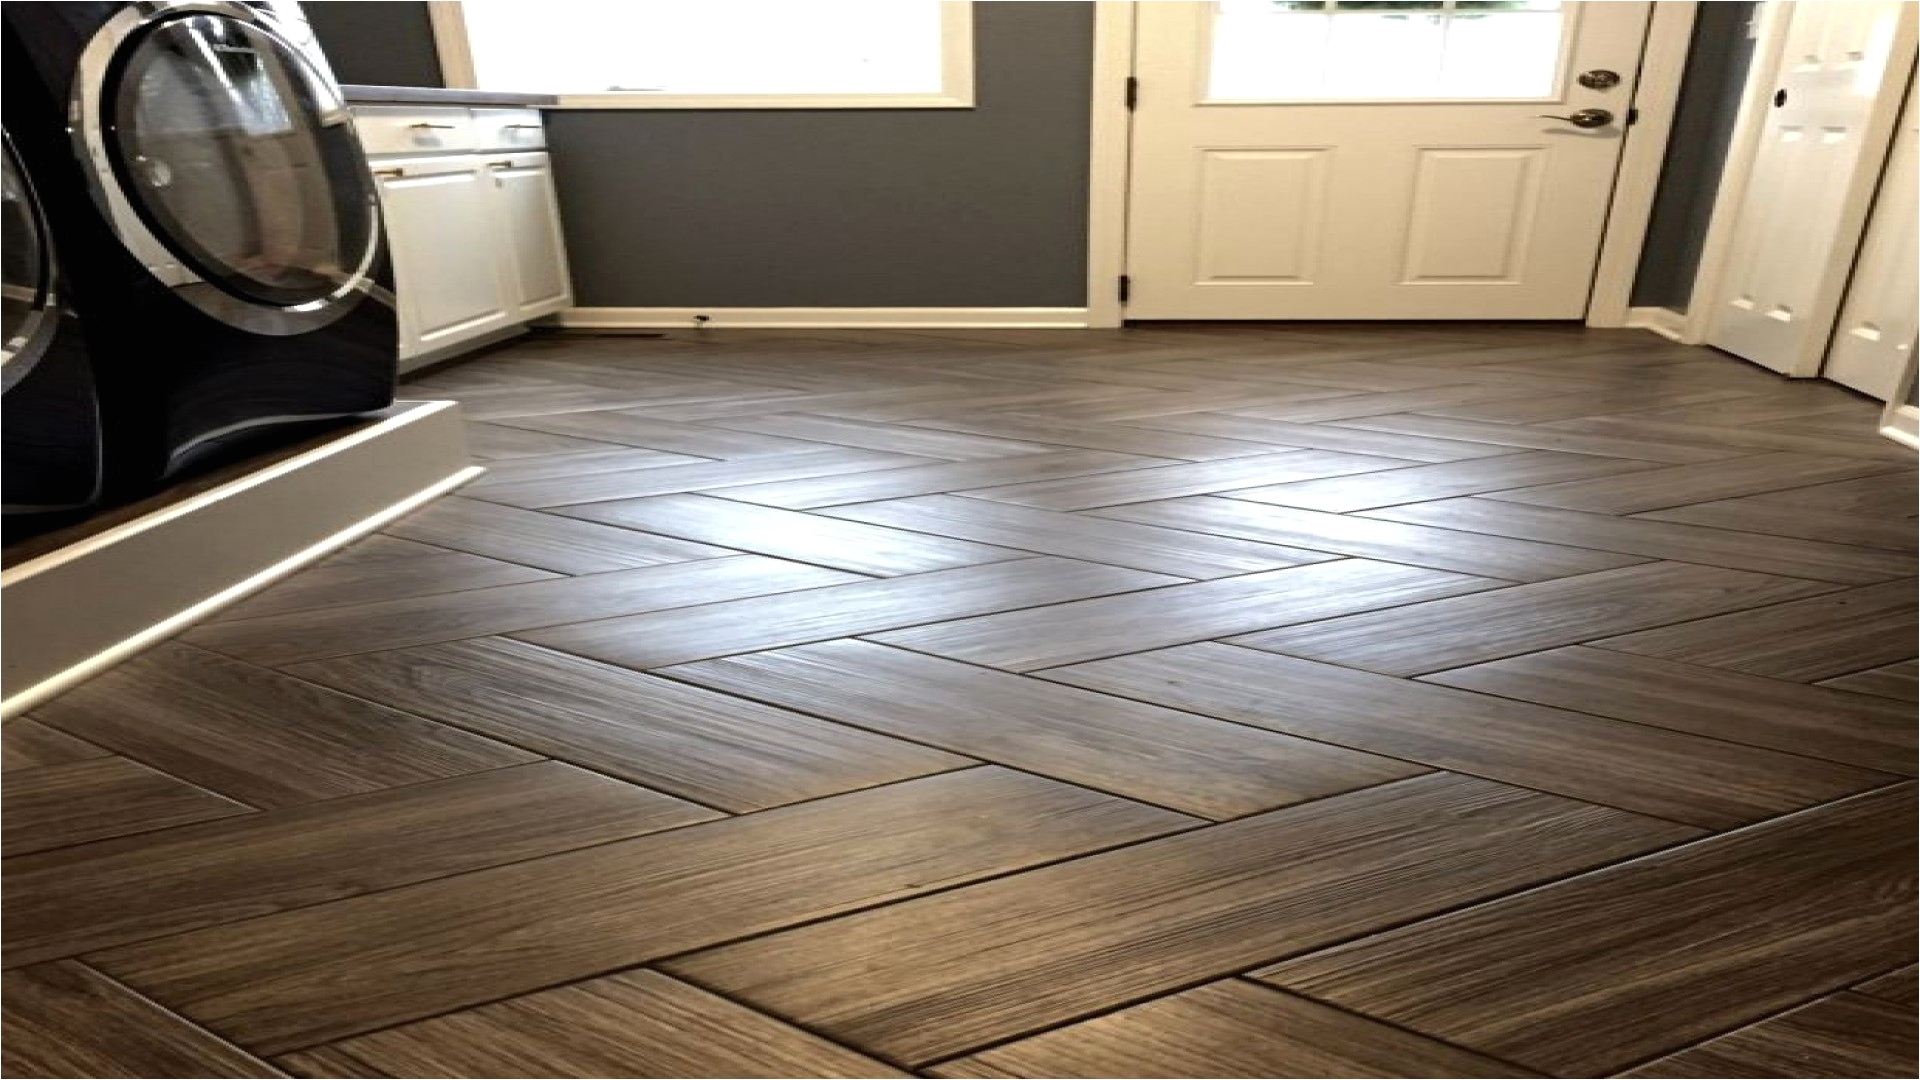 Homedepot Flooring Tile Home Depot Kitchen Floor Tile 50 Luxury Home Depot Stick Floor Tiles